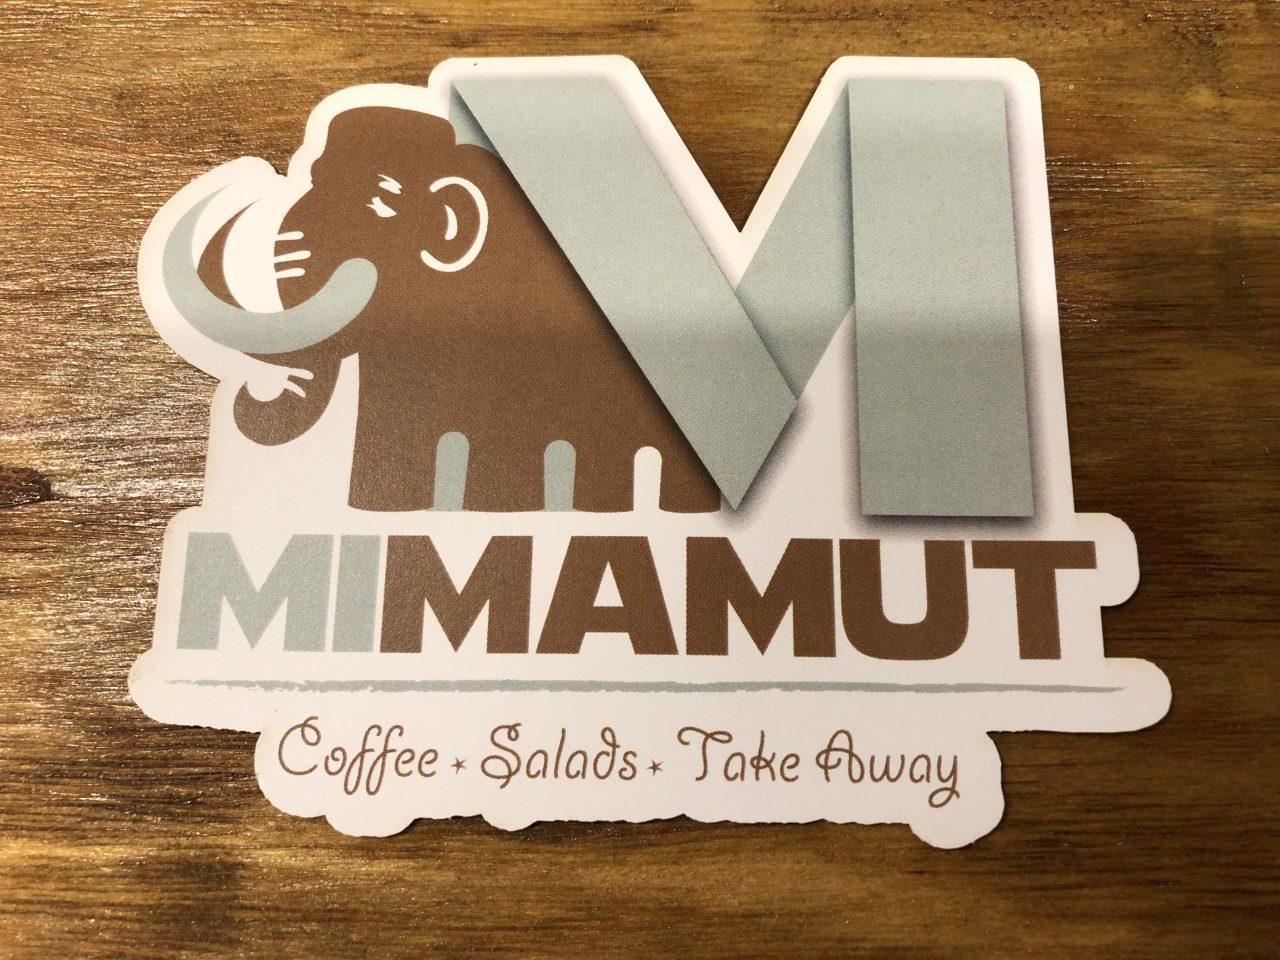 Mi Mamut